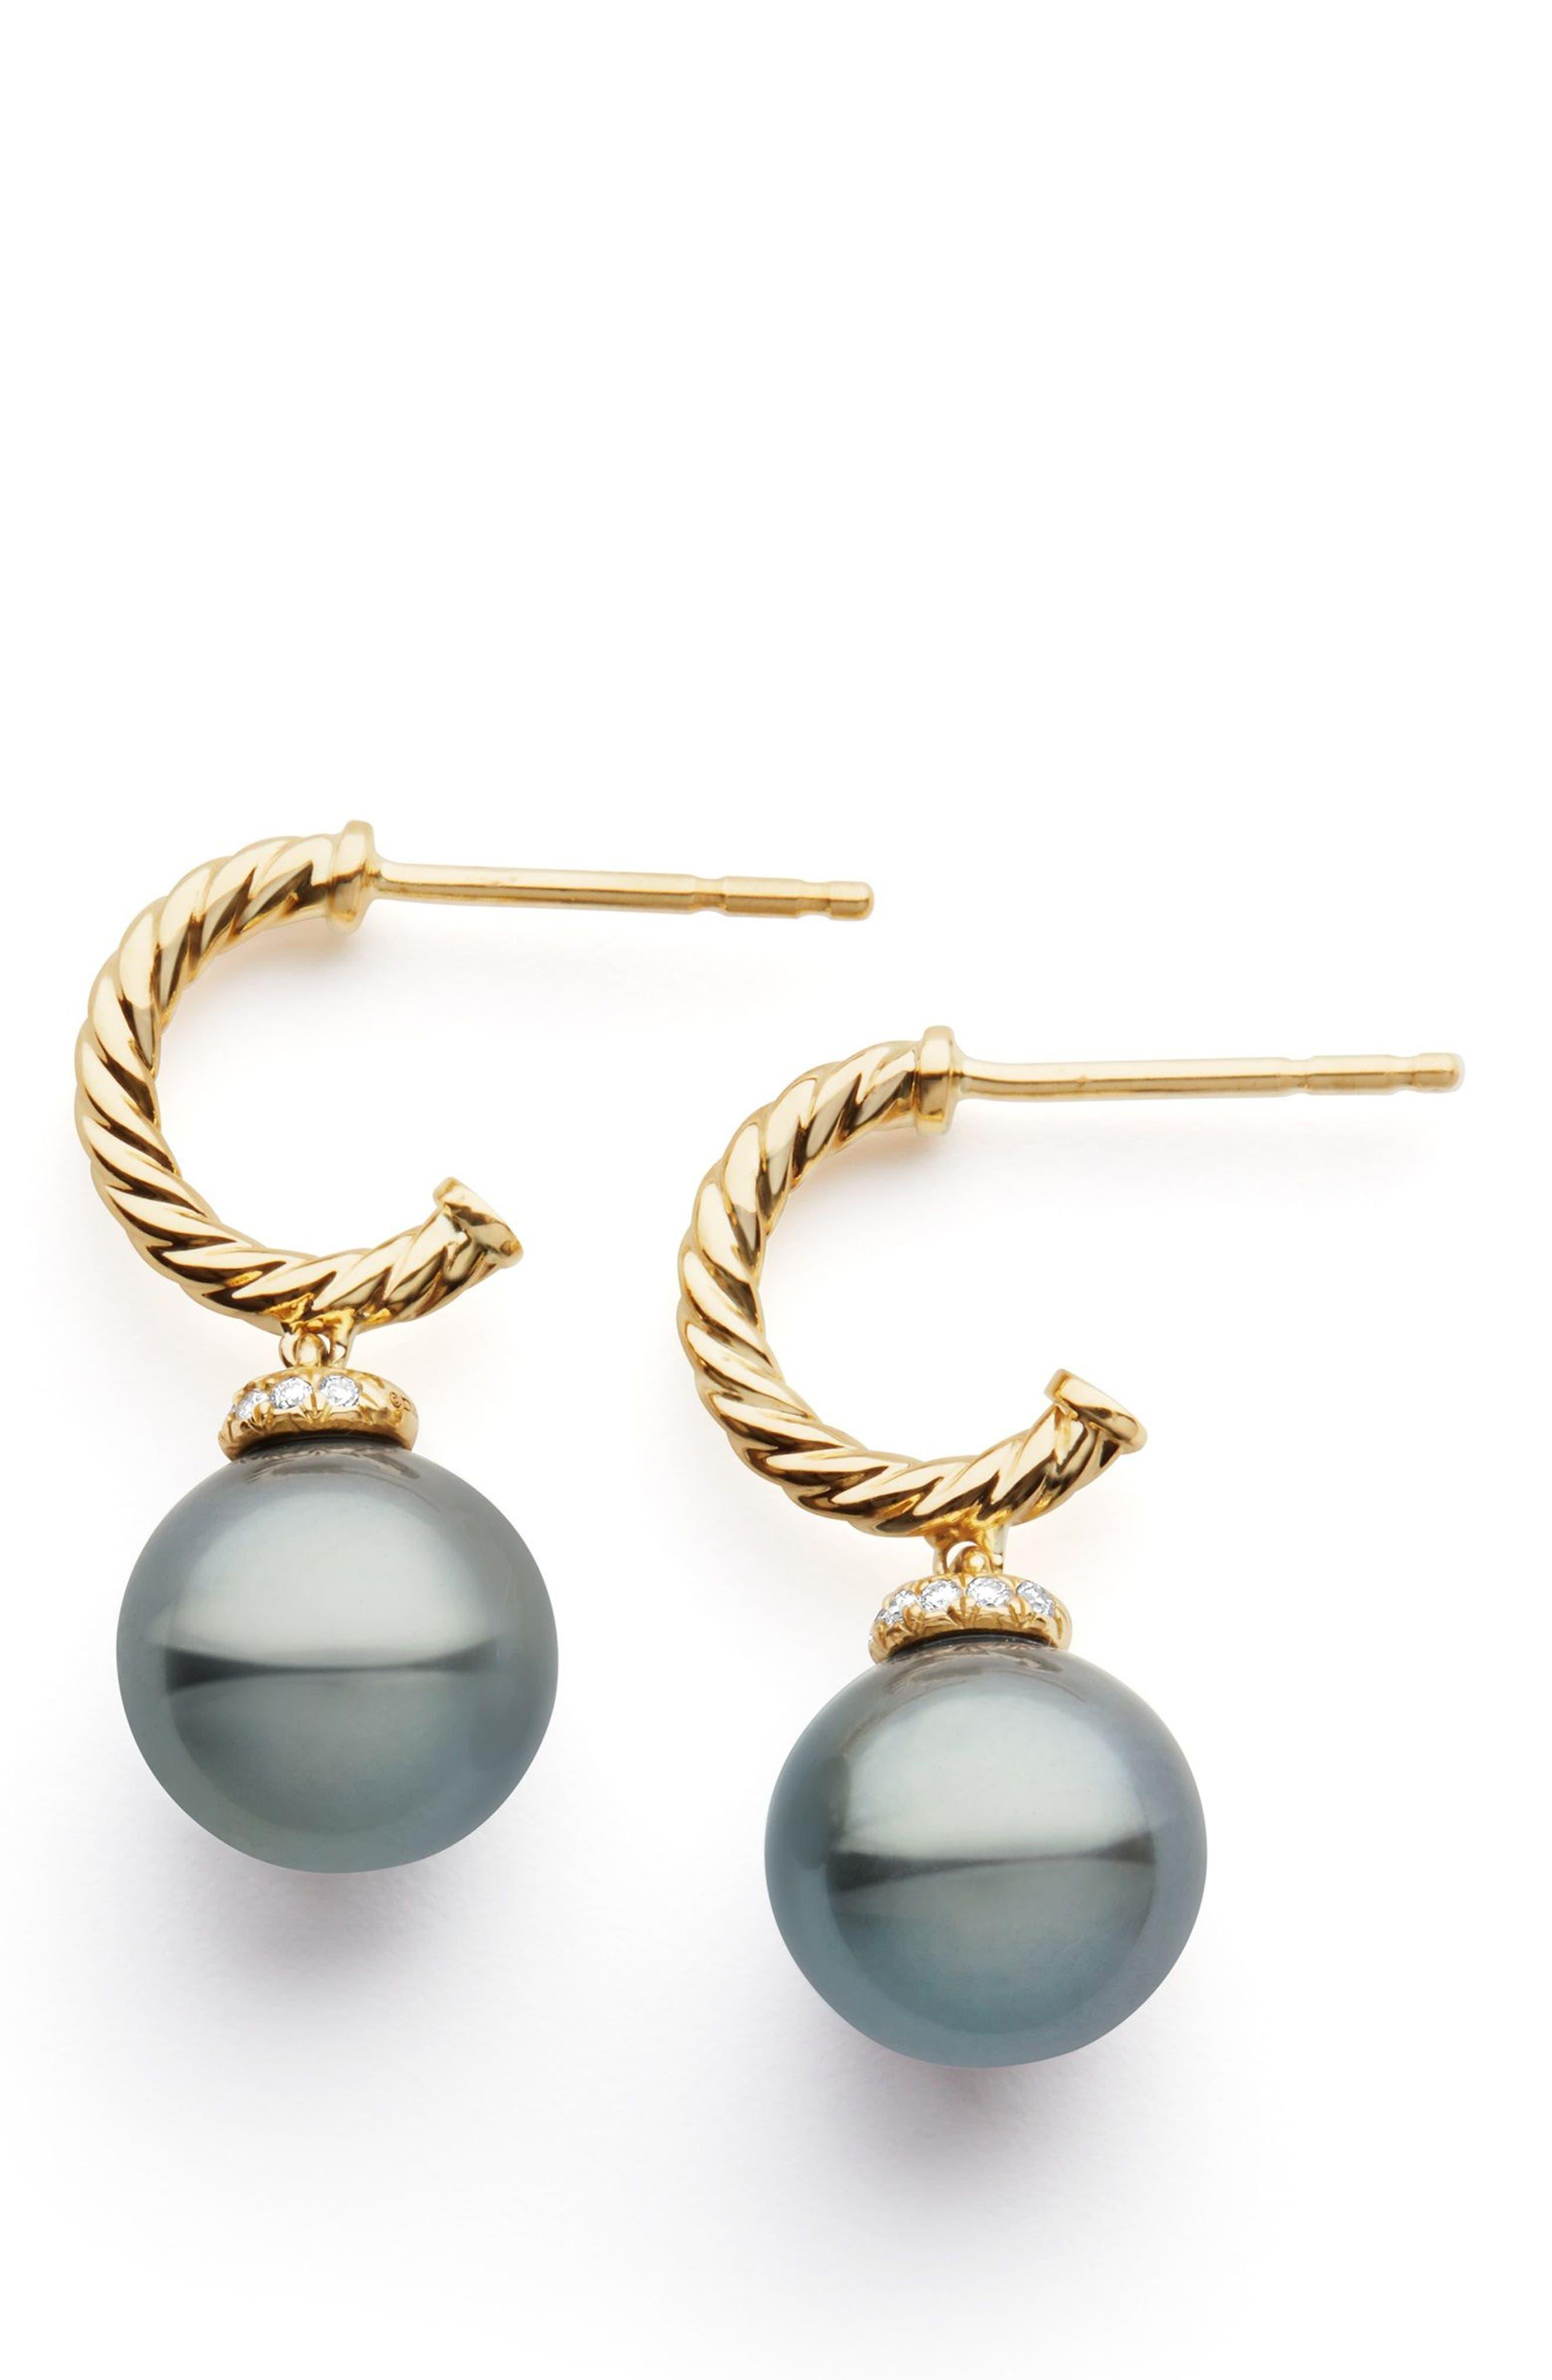 Solari Hoop Earrings with Diamonds and Genuine Pearl,                             Alternate thumbnail 2, color,                             GOLD/ DIAMOND/ GREY PEARL